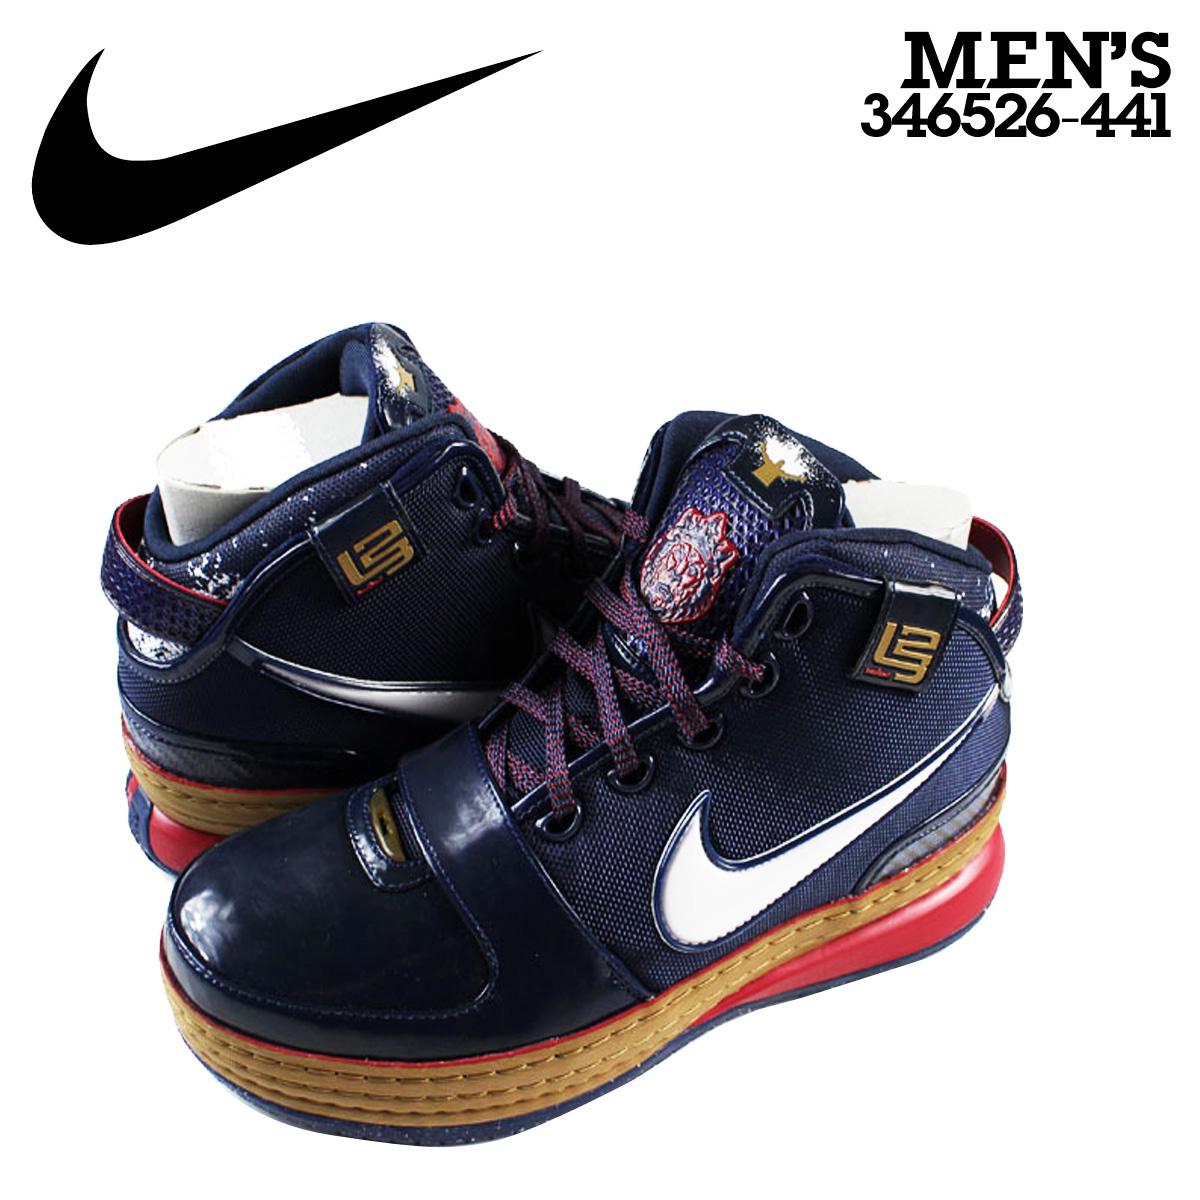 Nike NIKE zoom LeBron sneaker ZOOM LEBRON 6 CHALK EDITION 346526-441 Navy  men fd25e9629